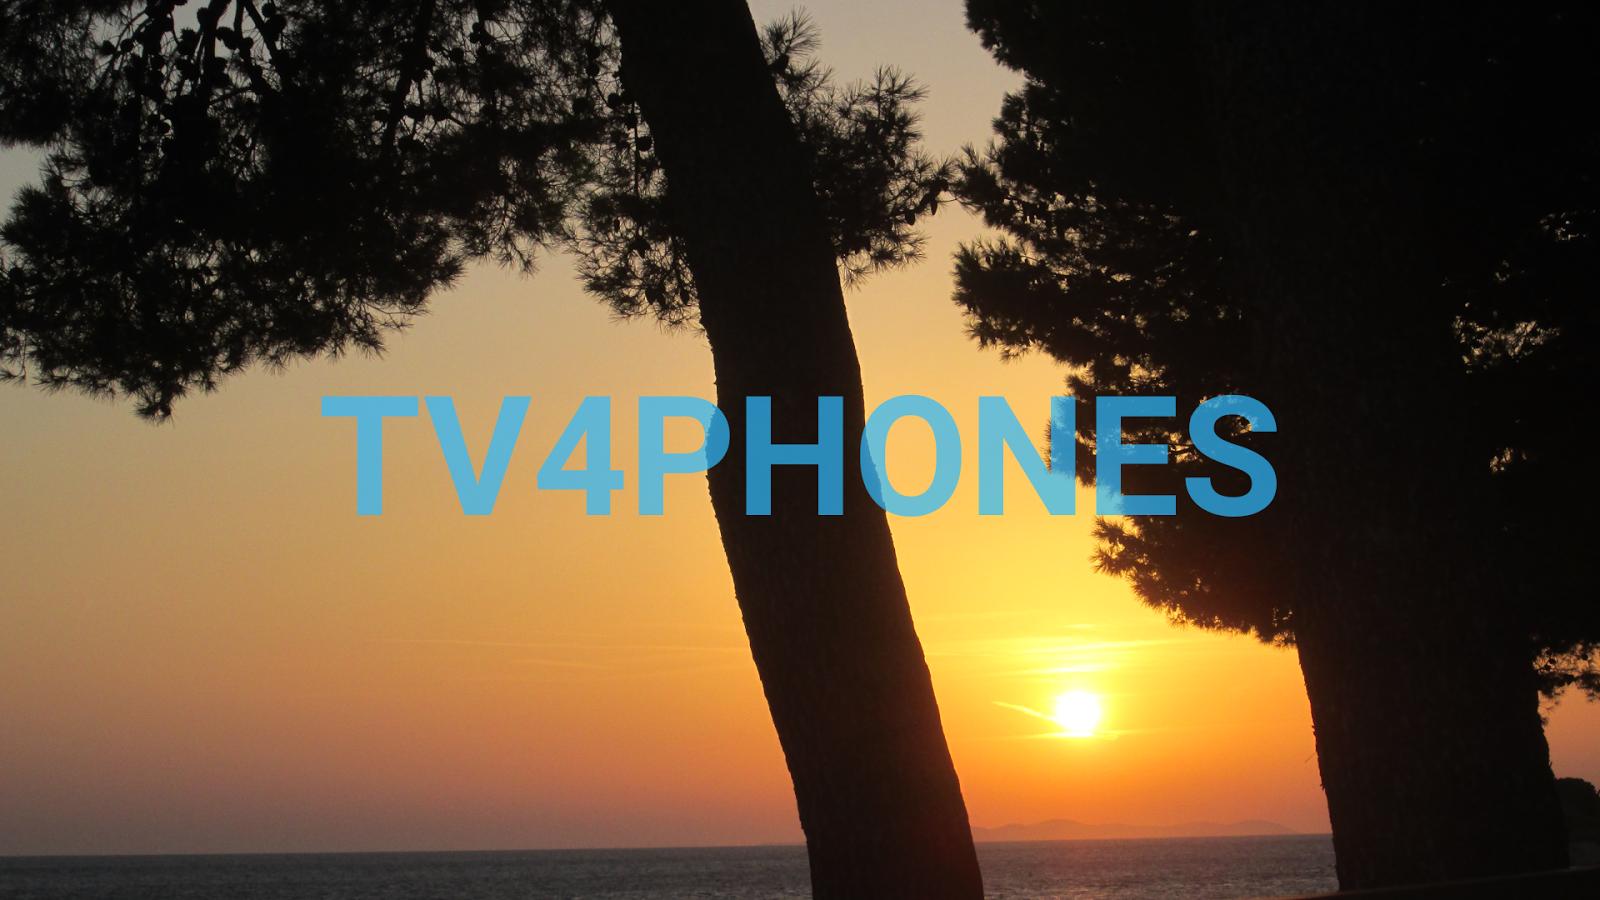 tv4phones - screenshot